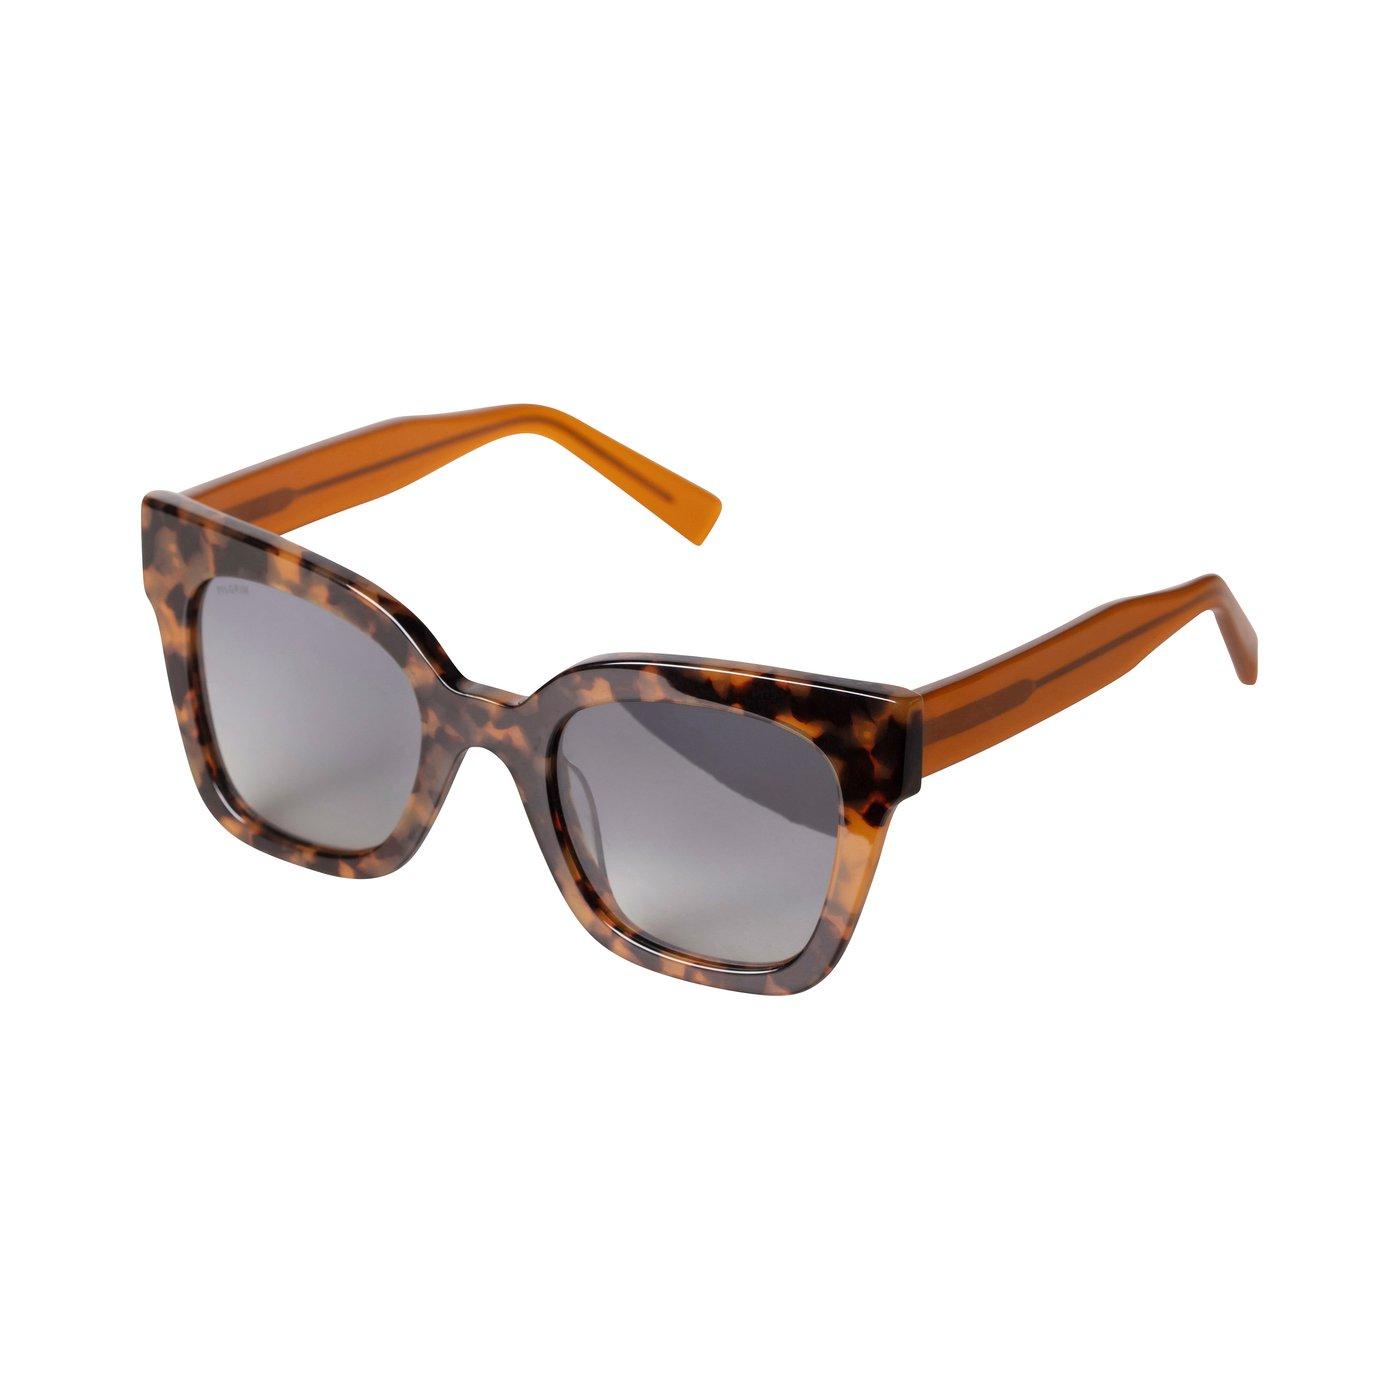 Gemma Sunglasses Brown